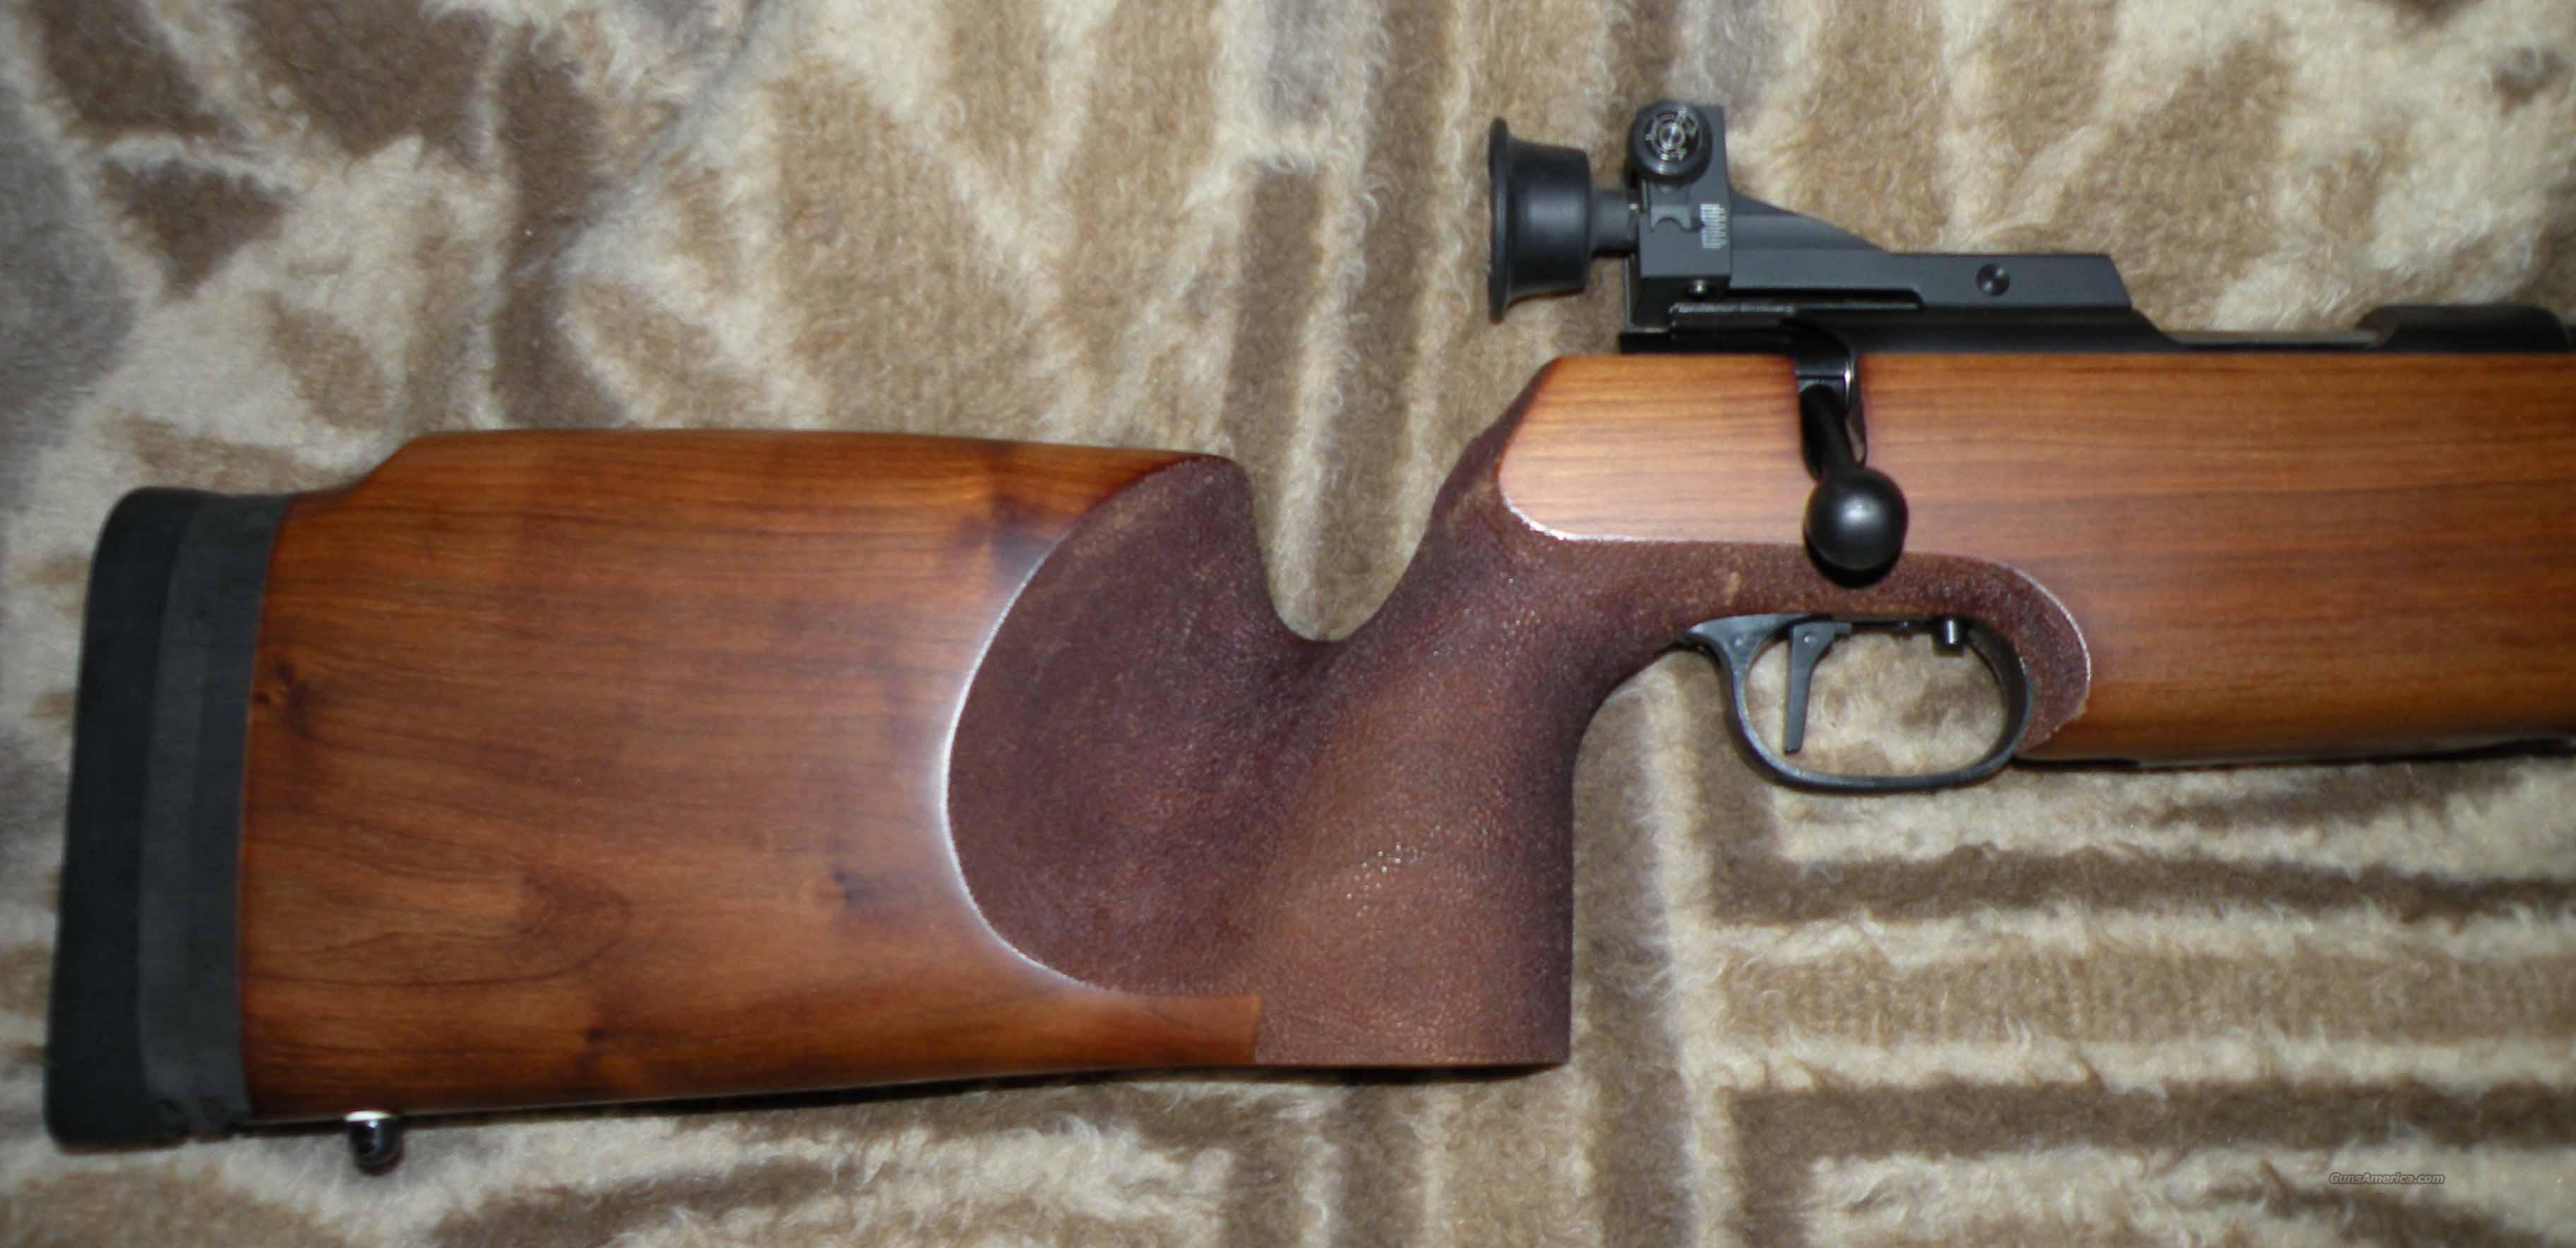 Walther Kk Uit 22 Lr Match Target Rifle Mint For Sale